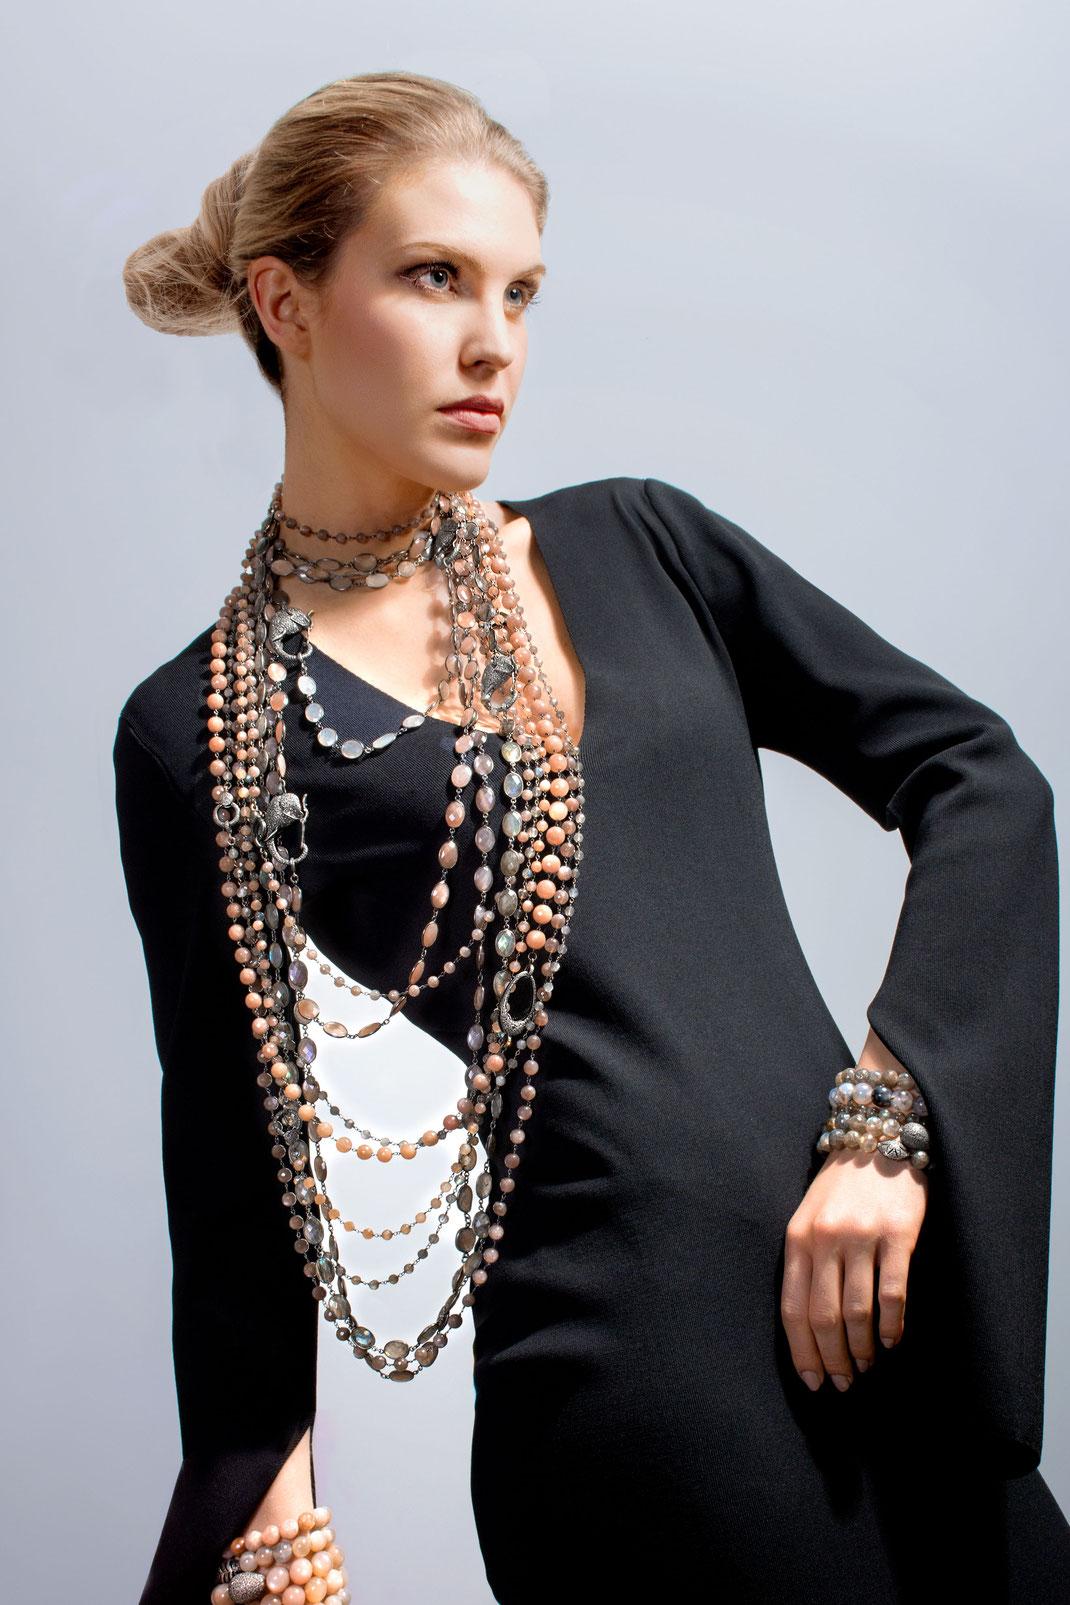 casual elegant long neckaces with diamond clasps worn layered